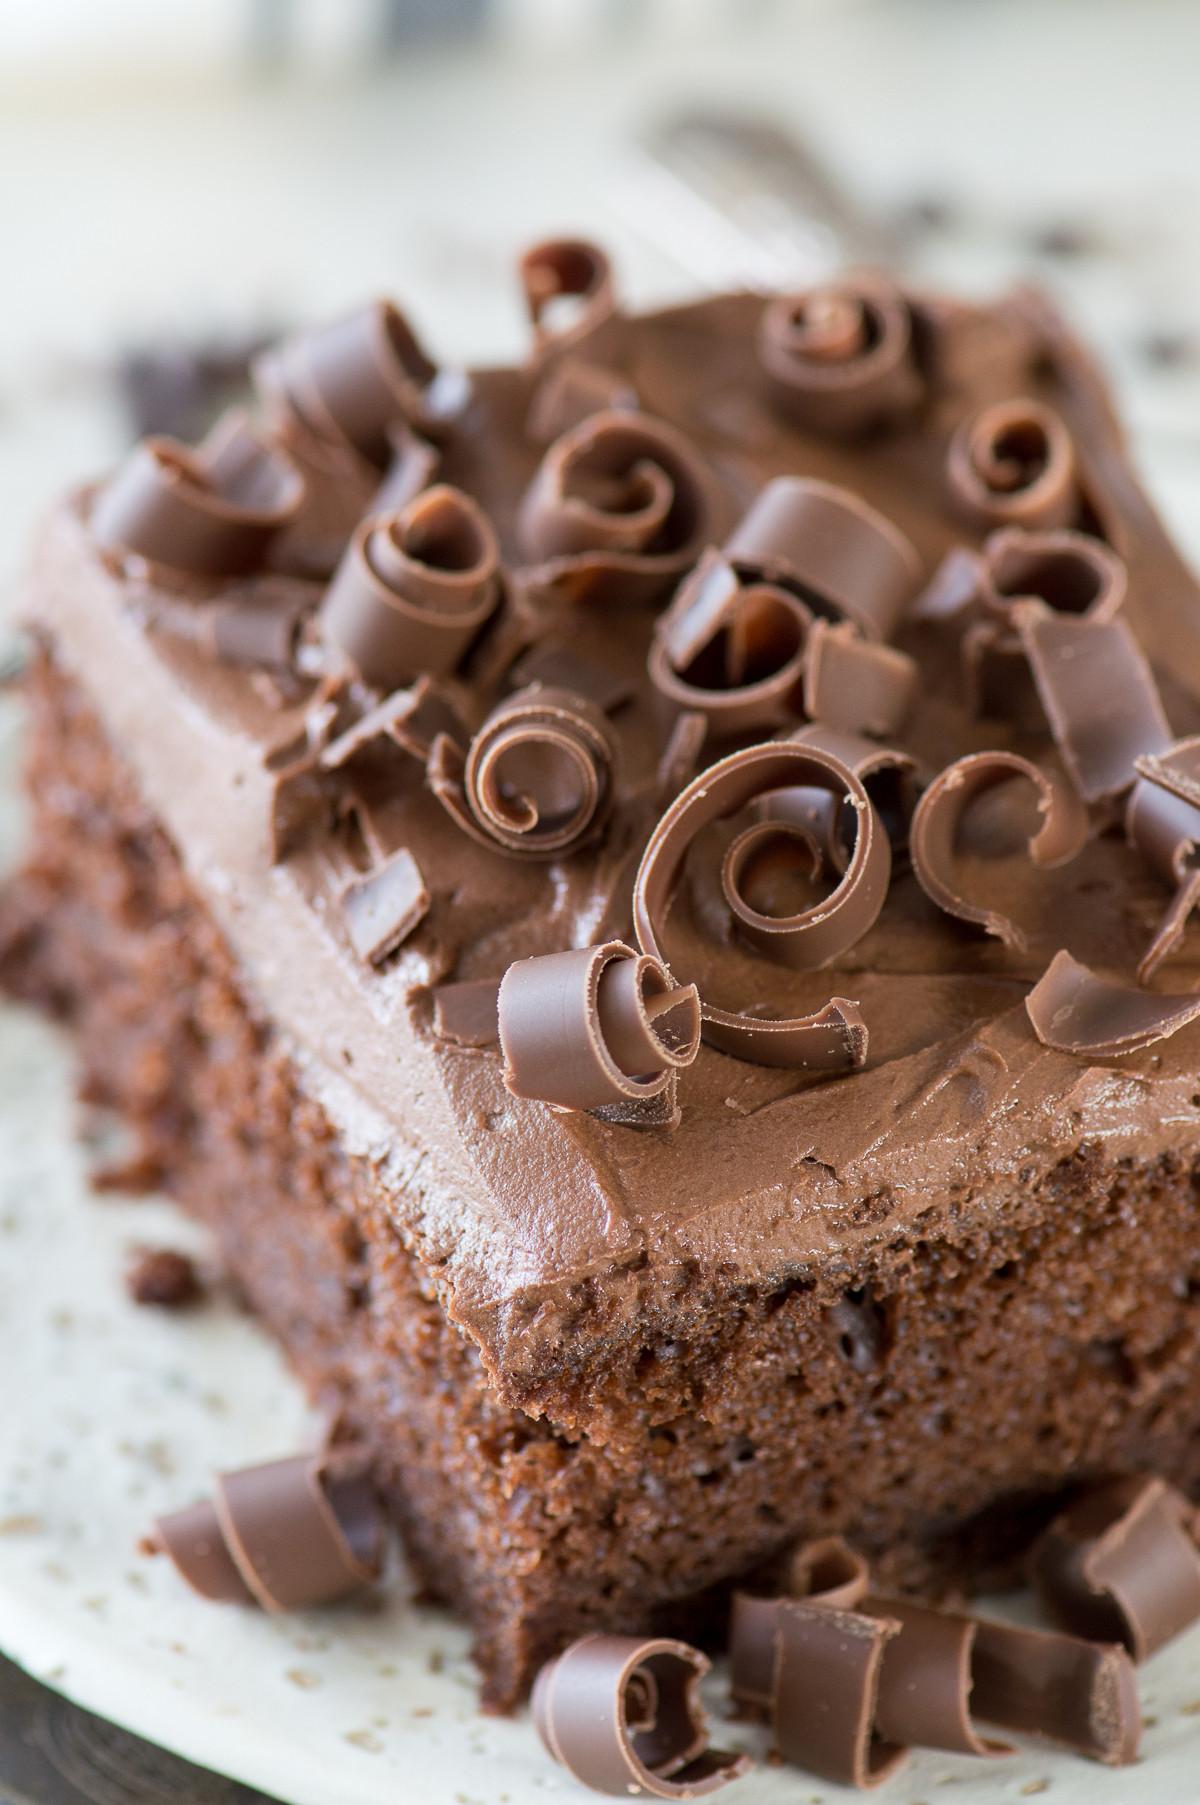 Chocolate Cake Mix Recipes  Doctored Up Chocolate Cake Mix